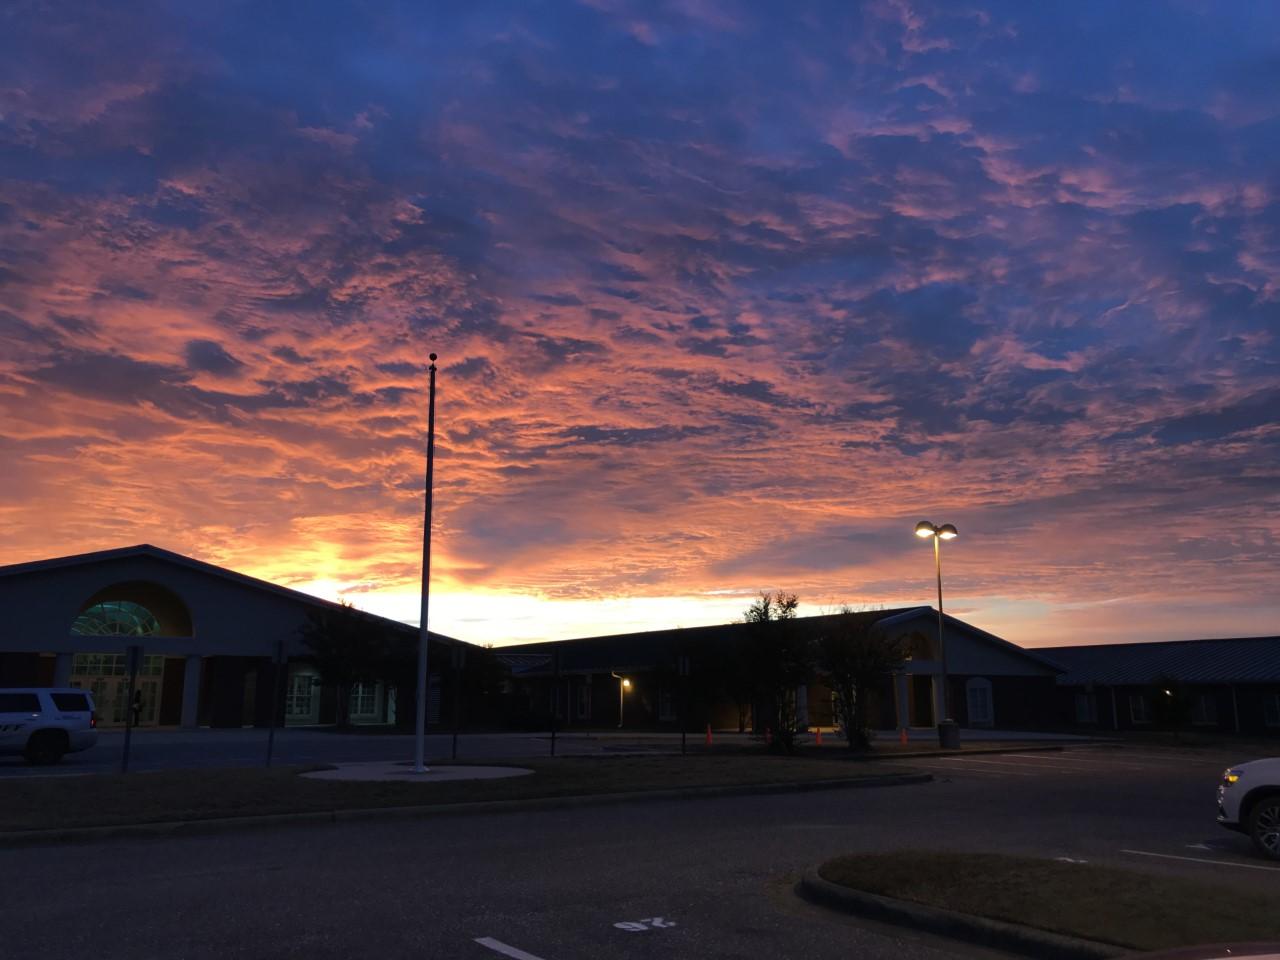 Sunrise at Billingsley School